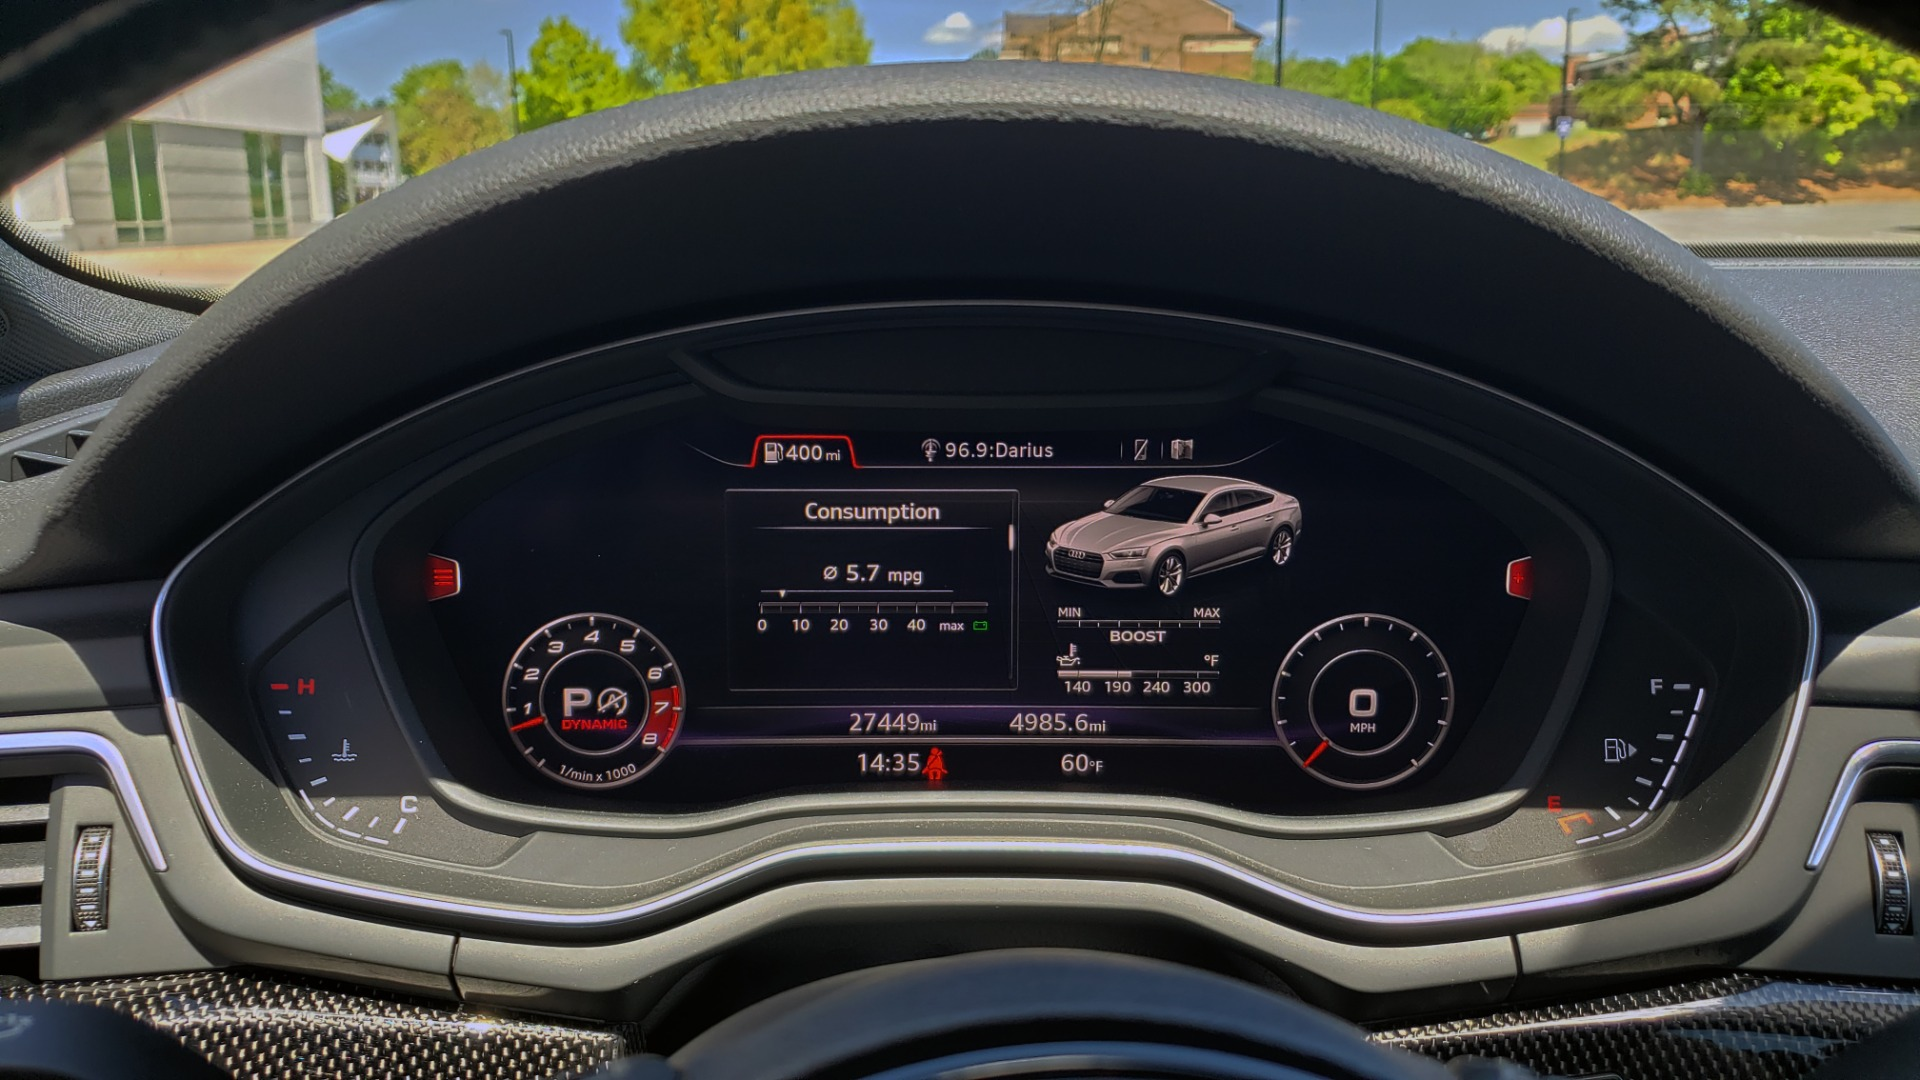 Used 2018 Audi S5 SPORTBACK PRESTIGE S-SPORT / NAV / SUNROOF / HUD / B&O SND / REARVIEW for sale $48,995 at Formula Imports in Charlotte NC 28227 39